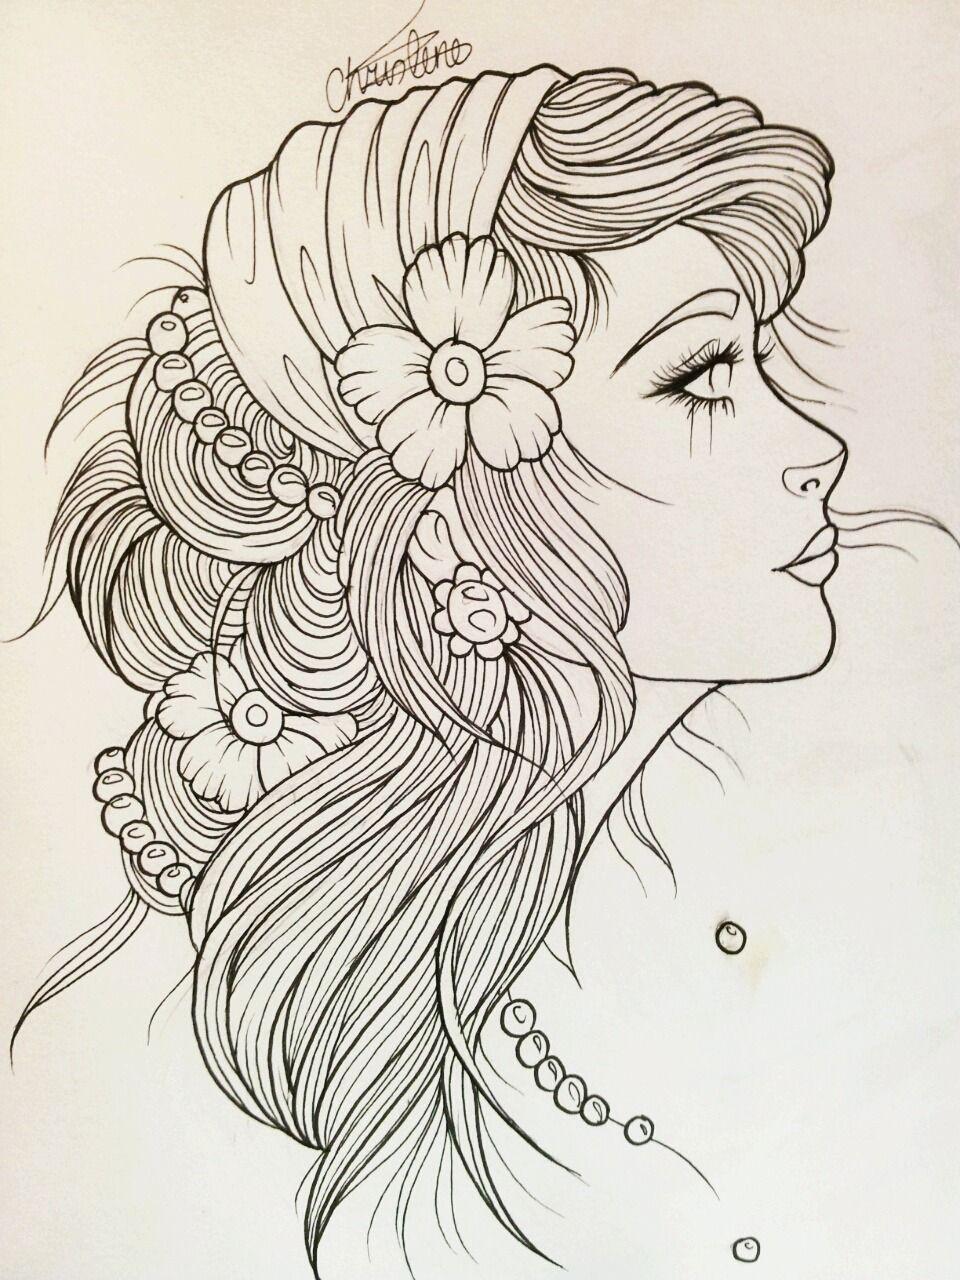 Pretty lady to color | mujeres | Pinterest | Colorear, Mandalas y Dibujo